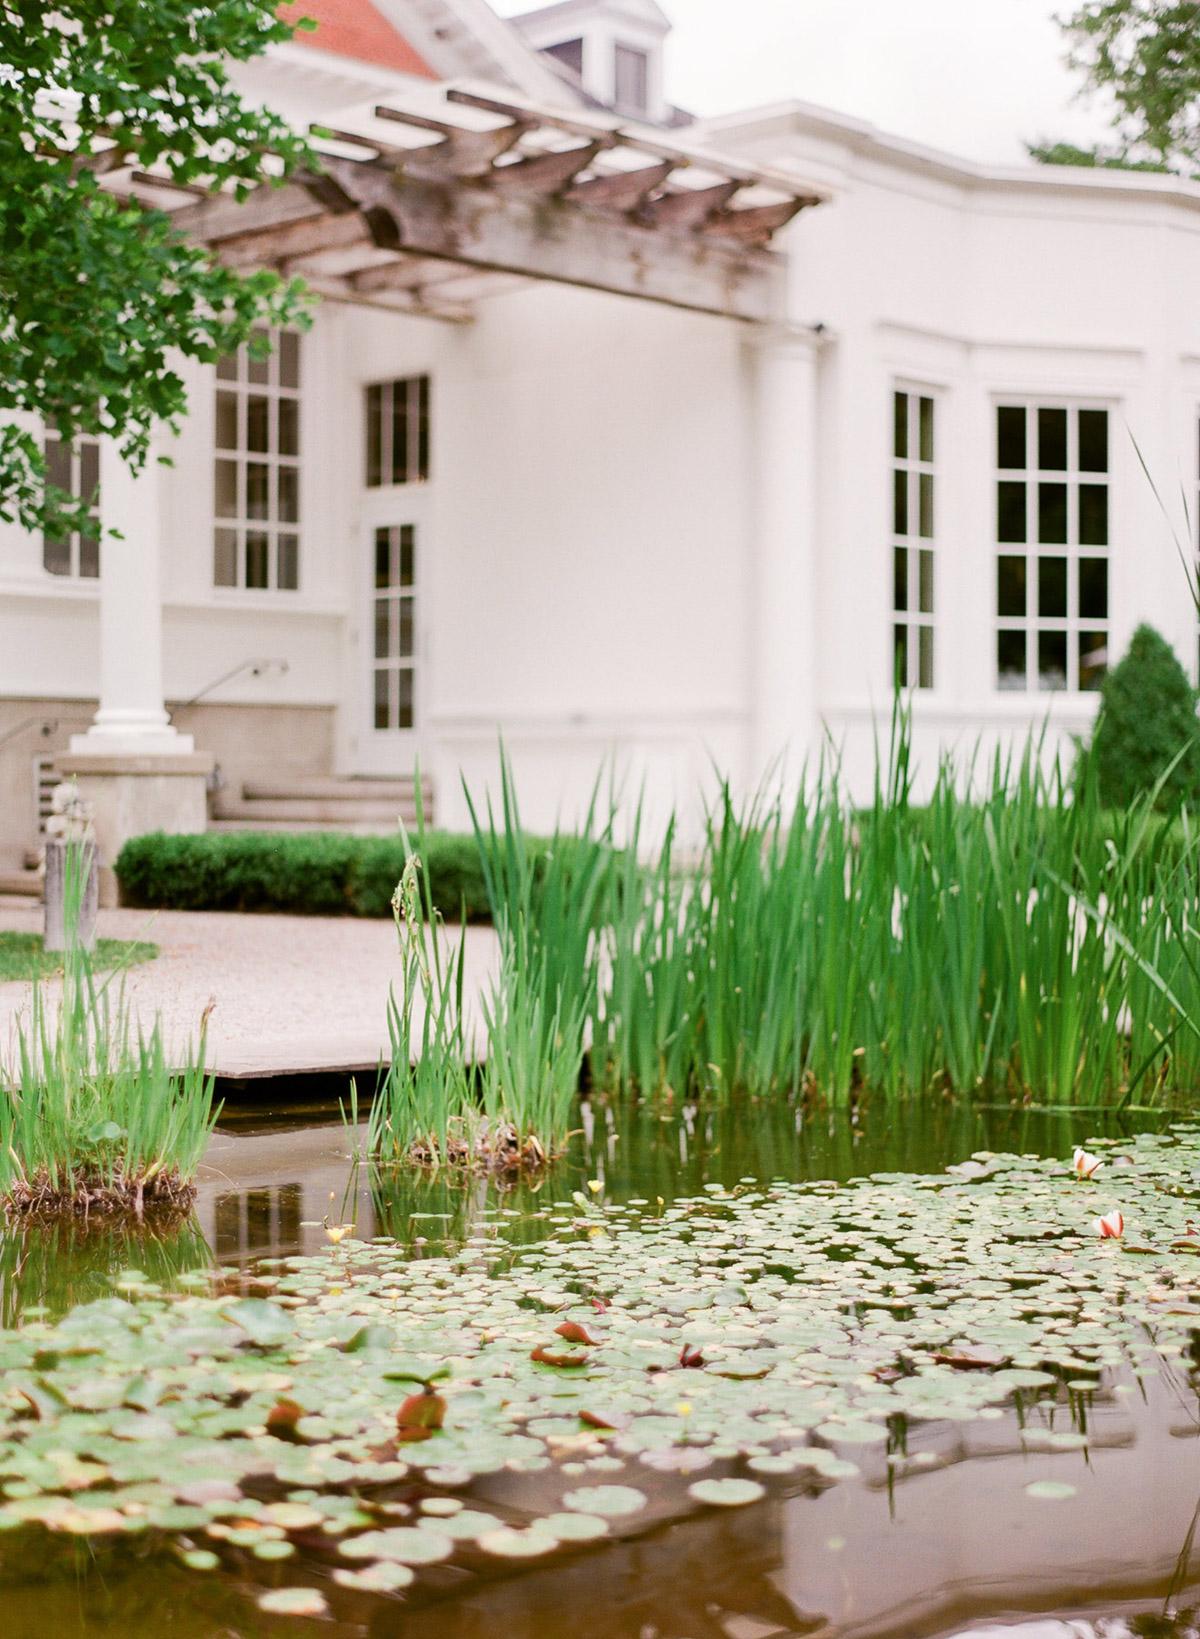 artiese-studios-vineyard-bride-swish-list-private-estate-cambridge-wedding-36.jpg